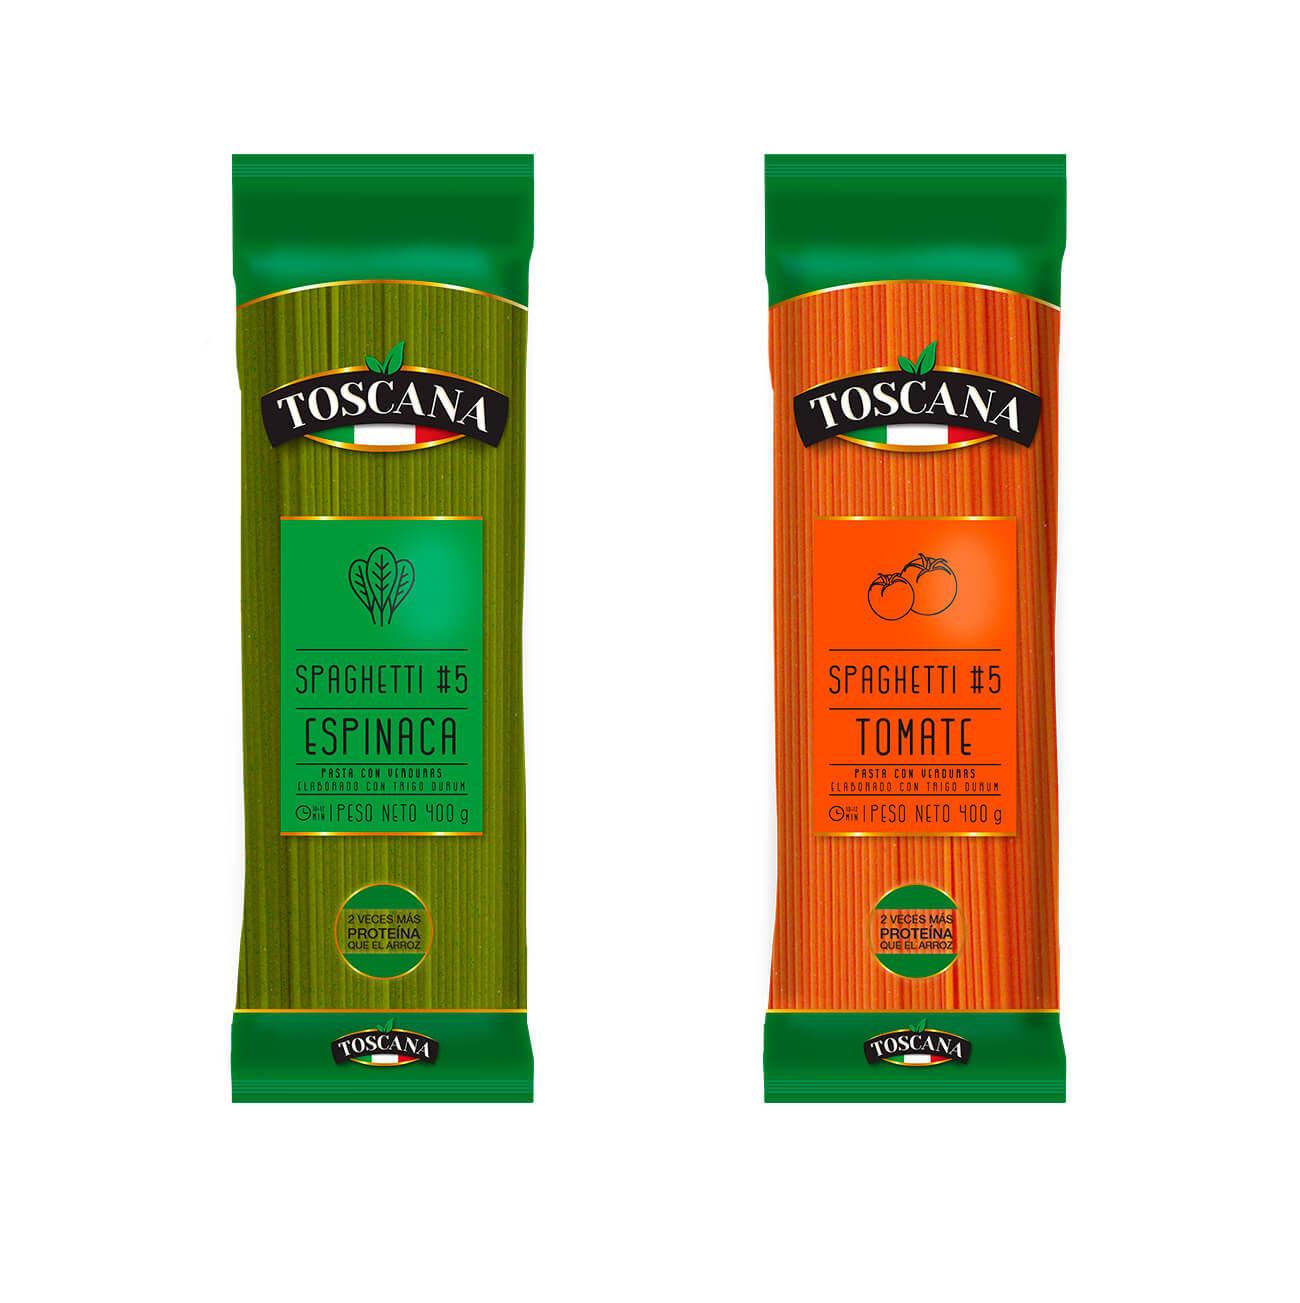 toscana-noticias-lanzamiento-spaghetti-verduras